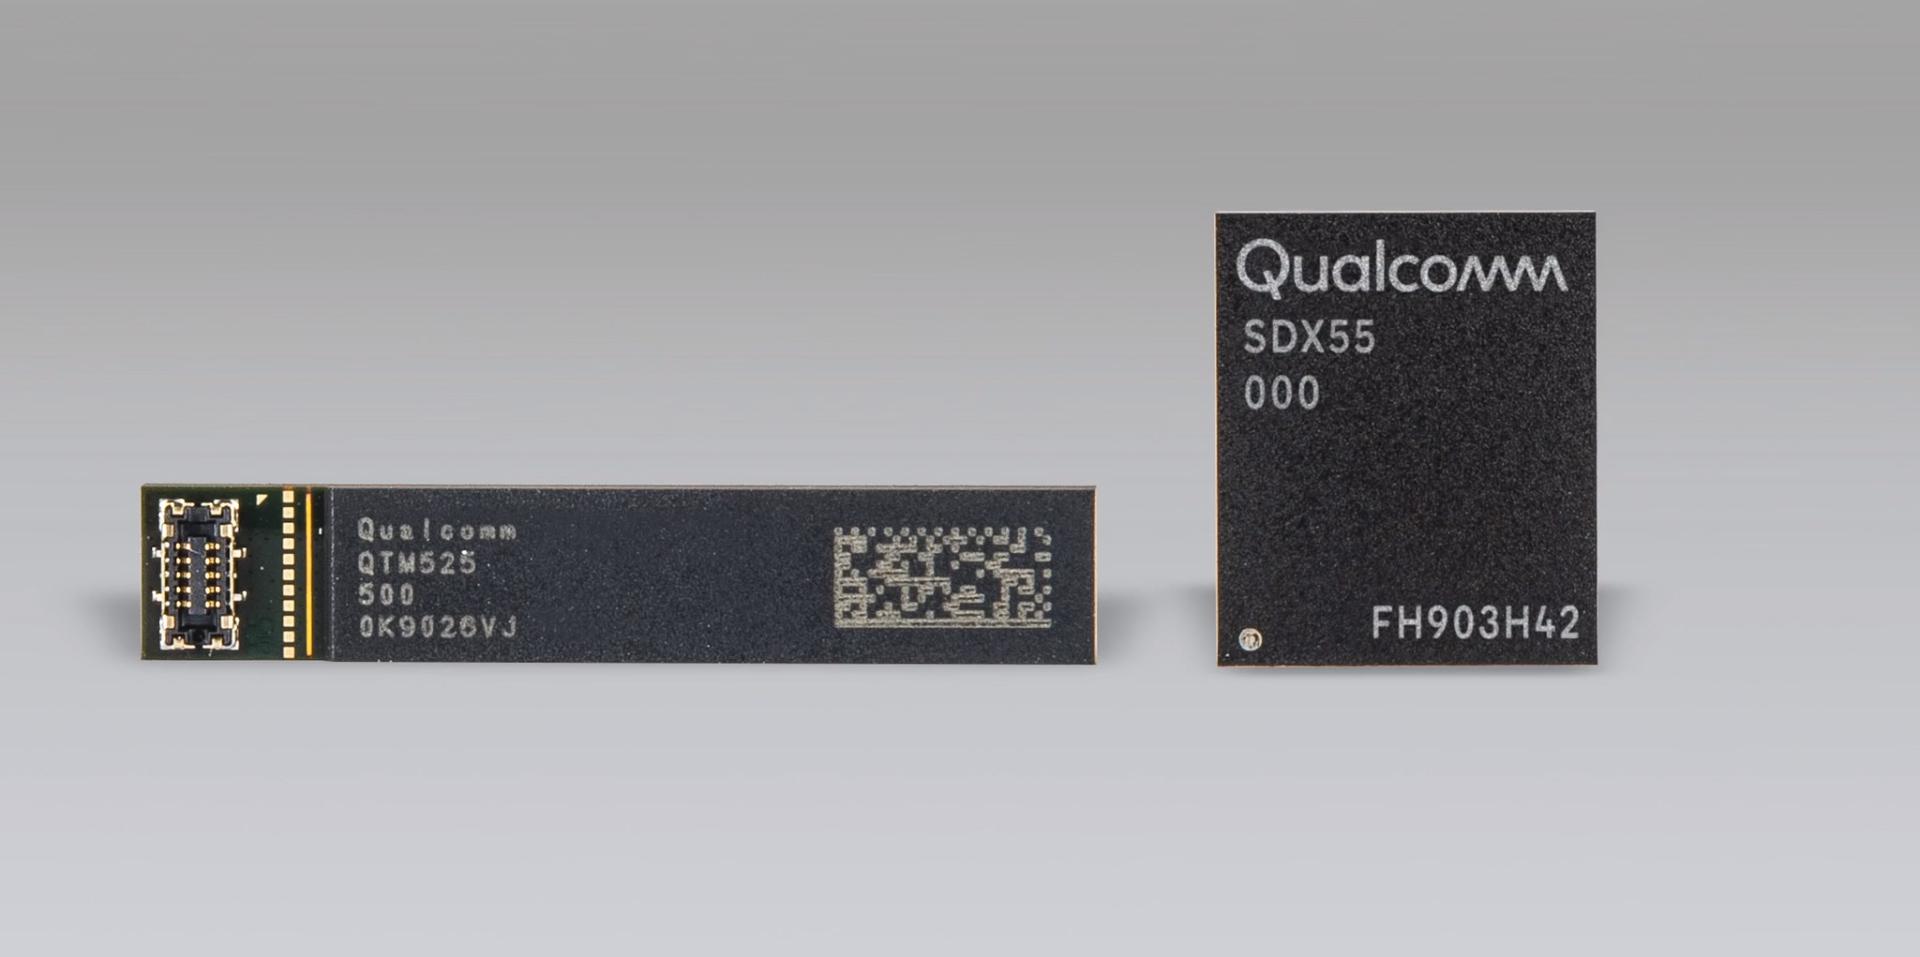 Qualcomm's new QTM525 5G mmWave antenna module and Snapdragon X55 5G modem.